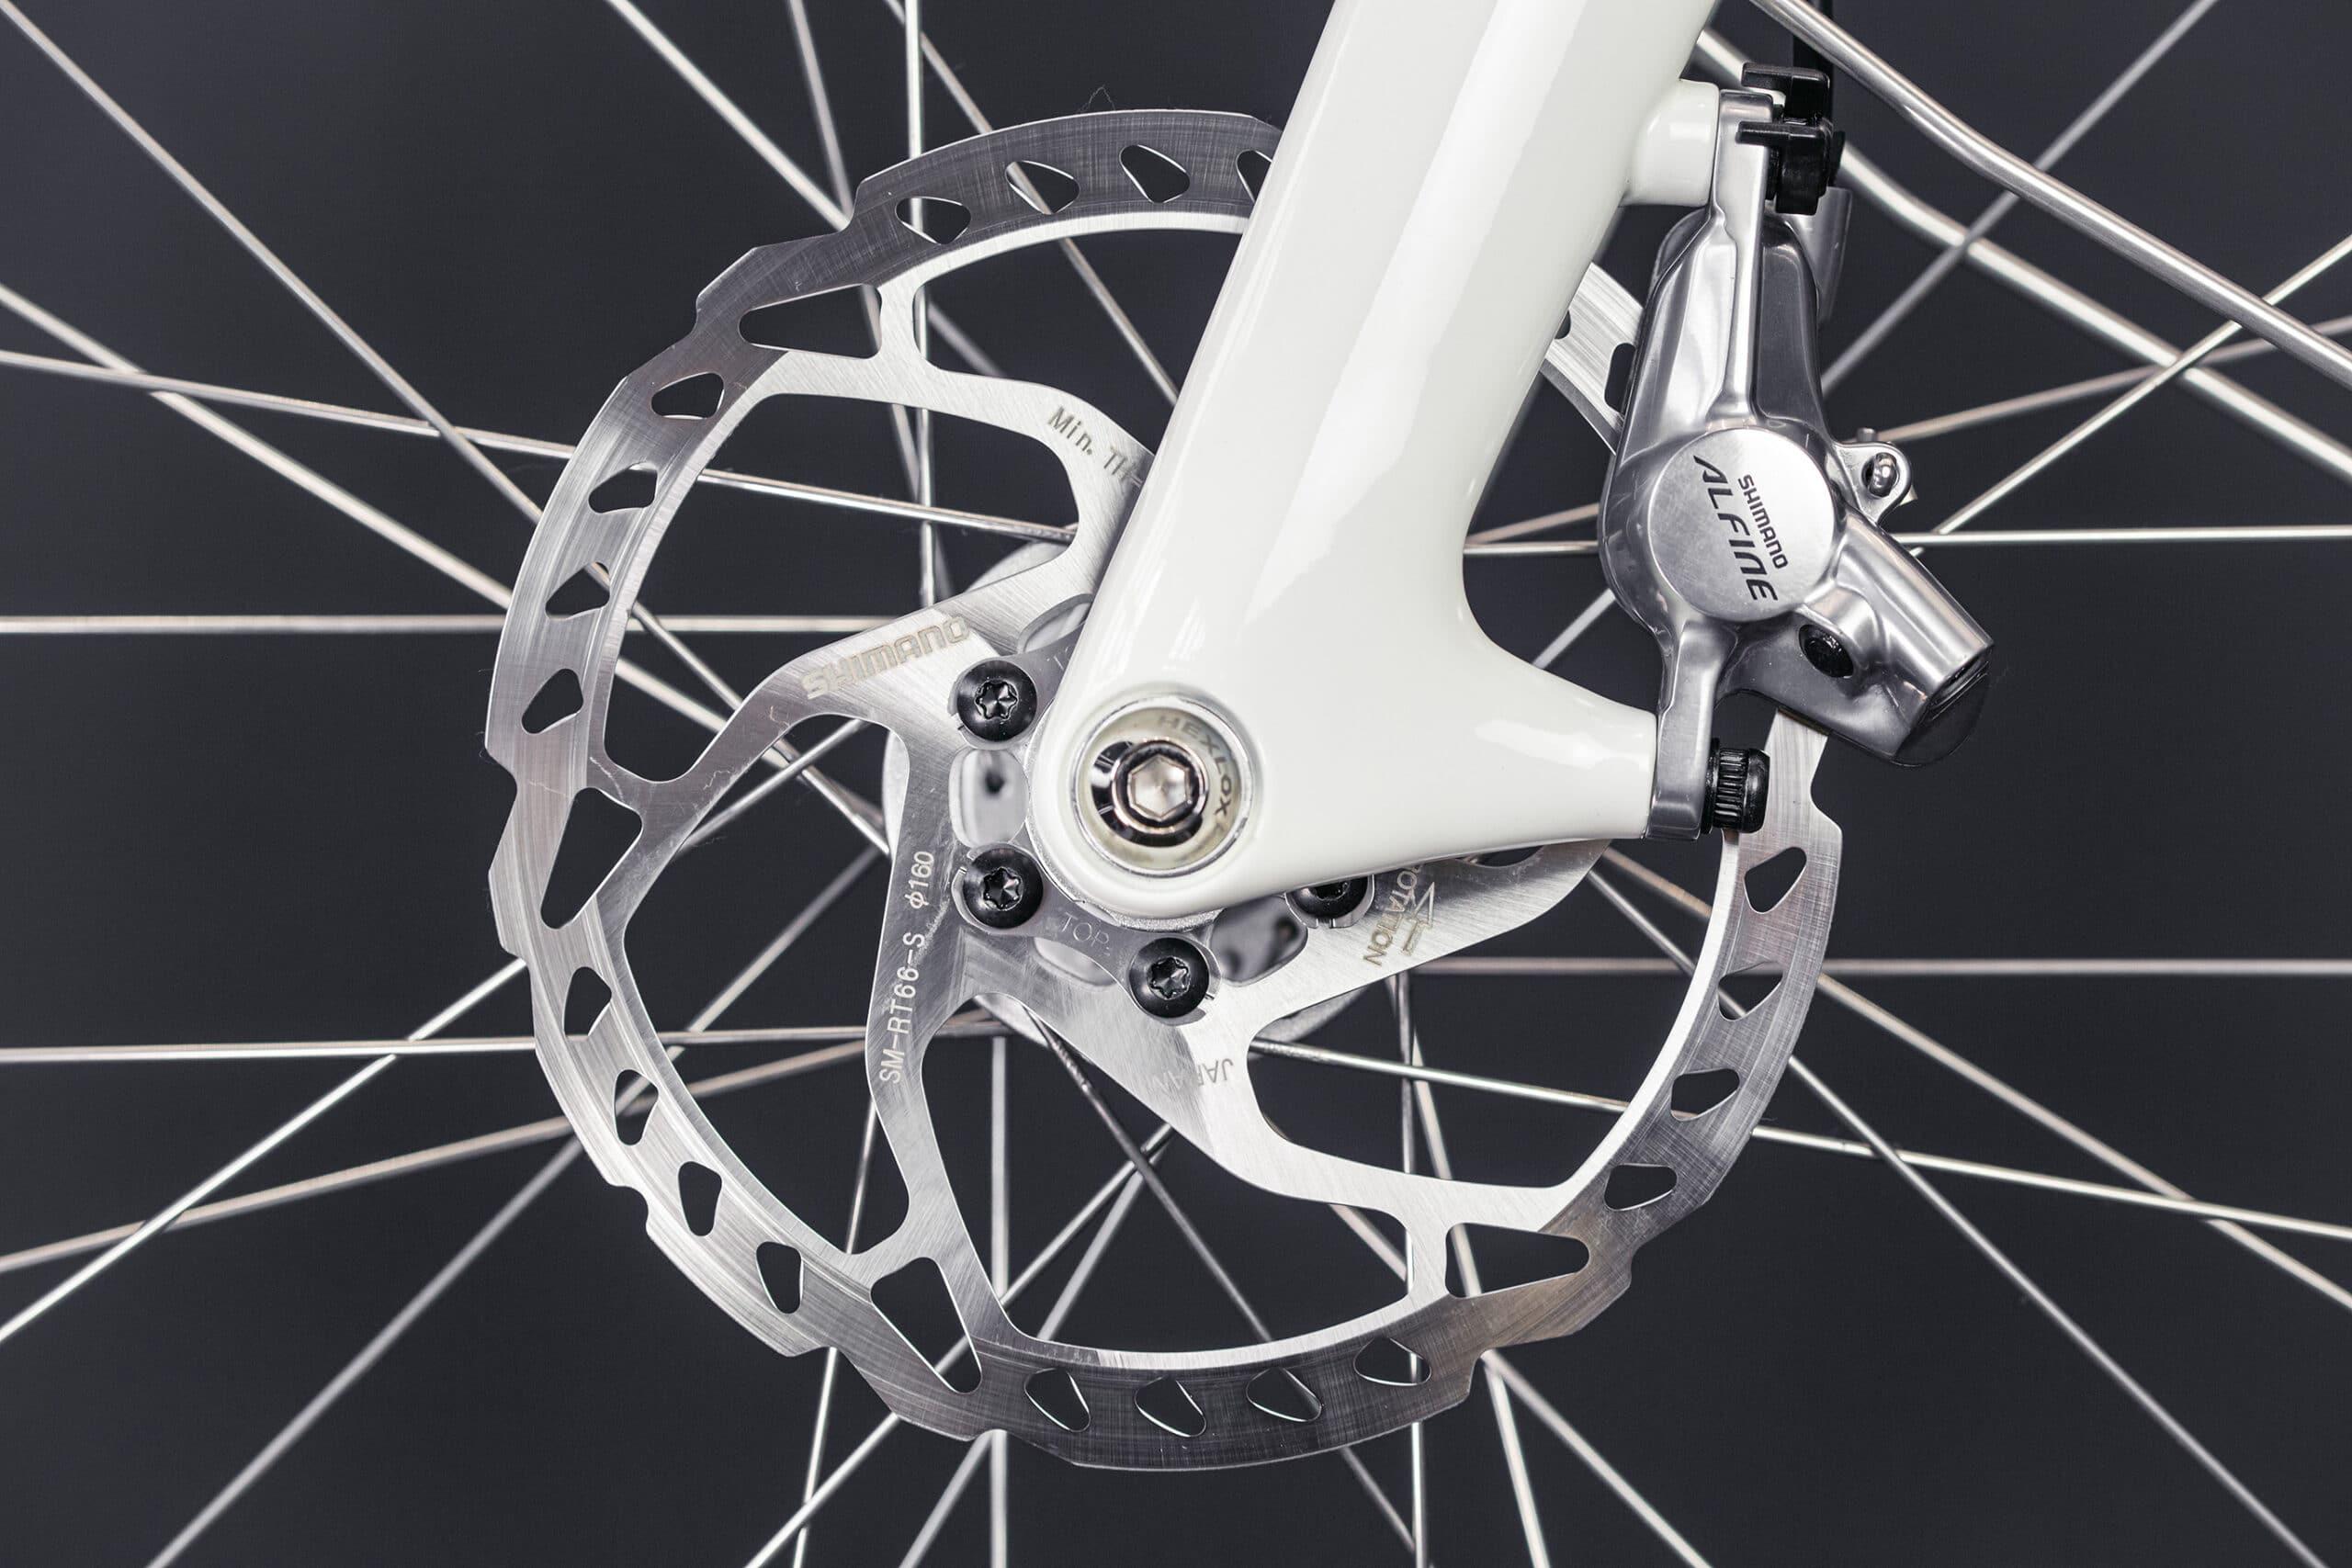 schindelhauer Antonia Pinion e-bike -19